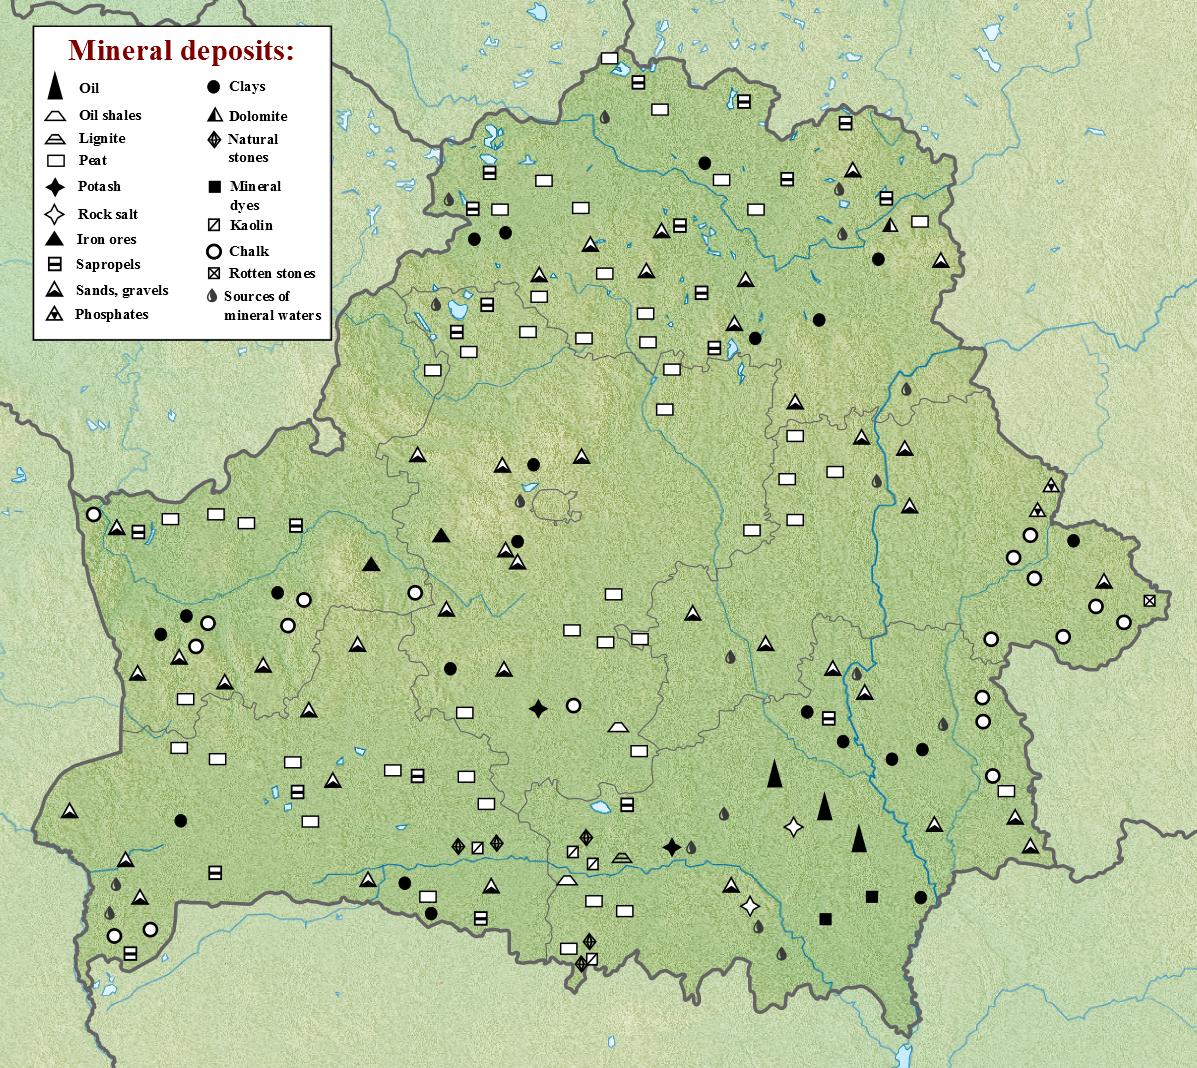 Belarus: minerals. Mineral deposits of Belarus